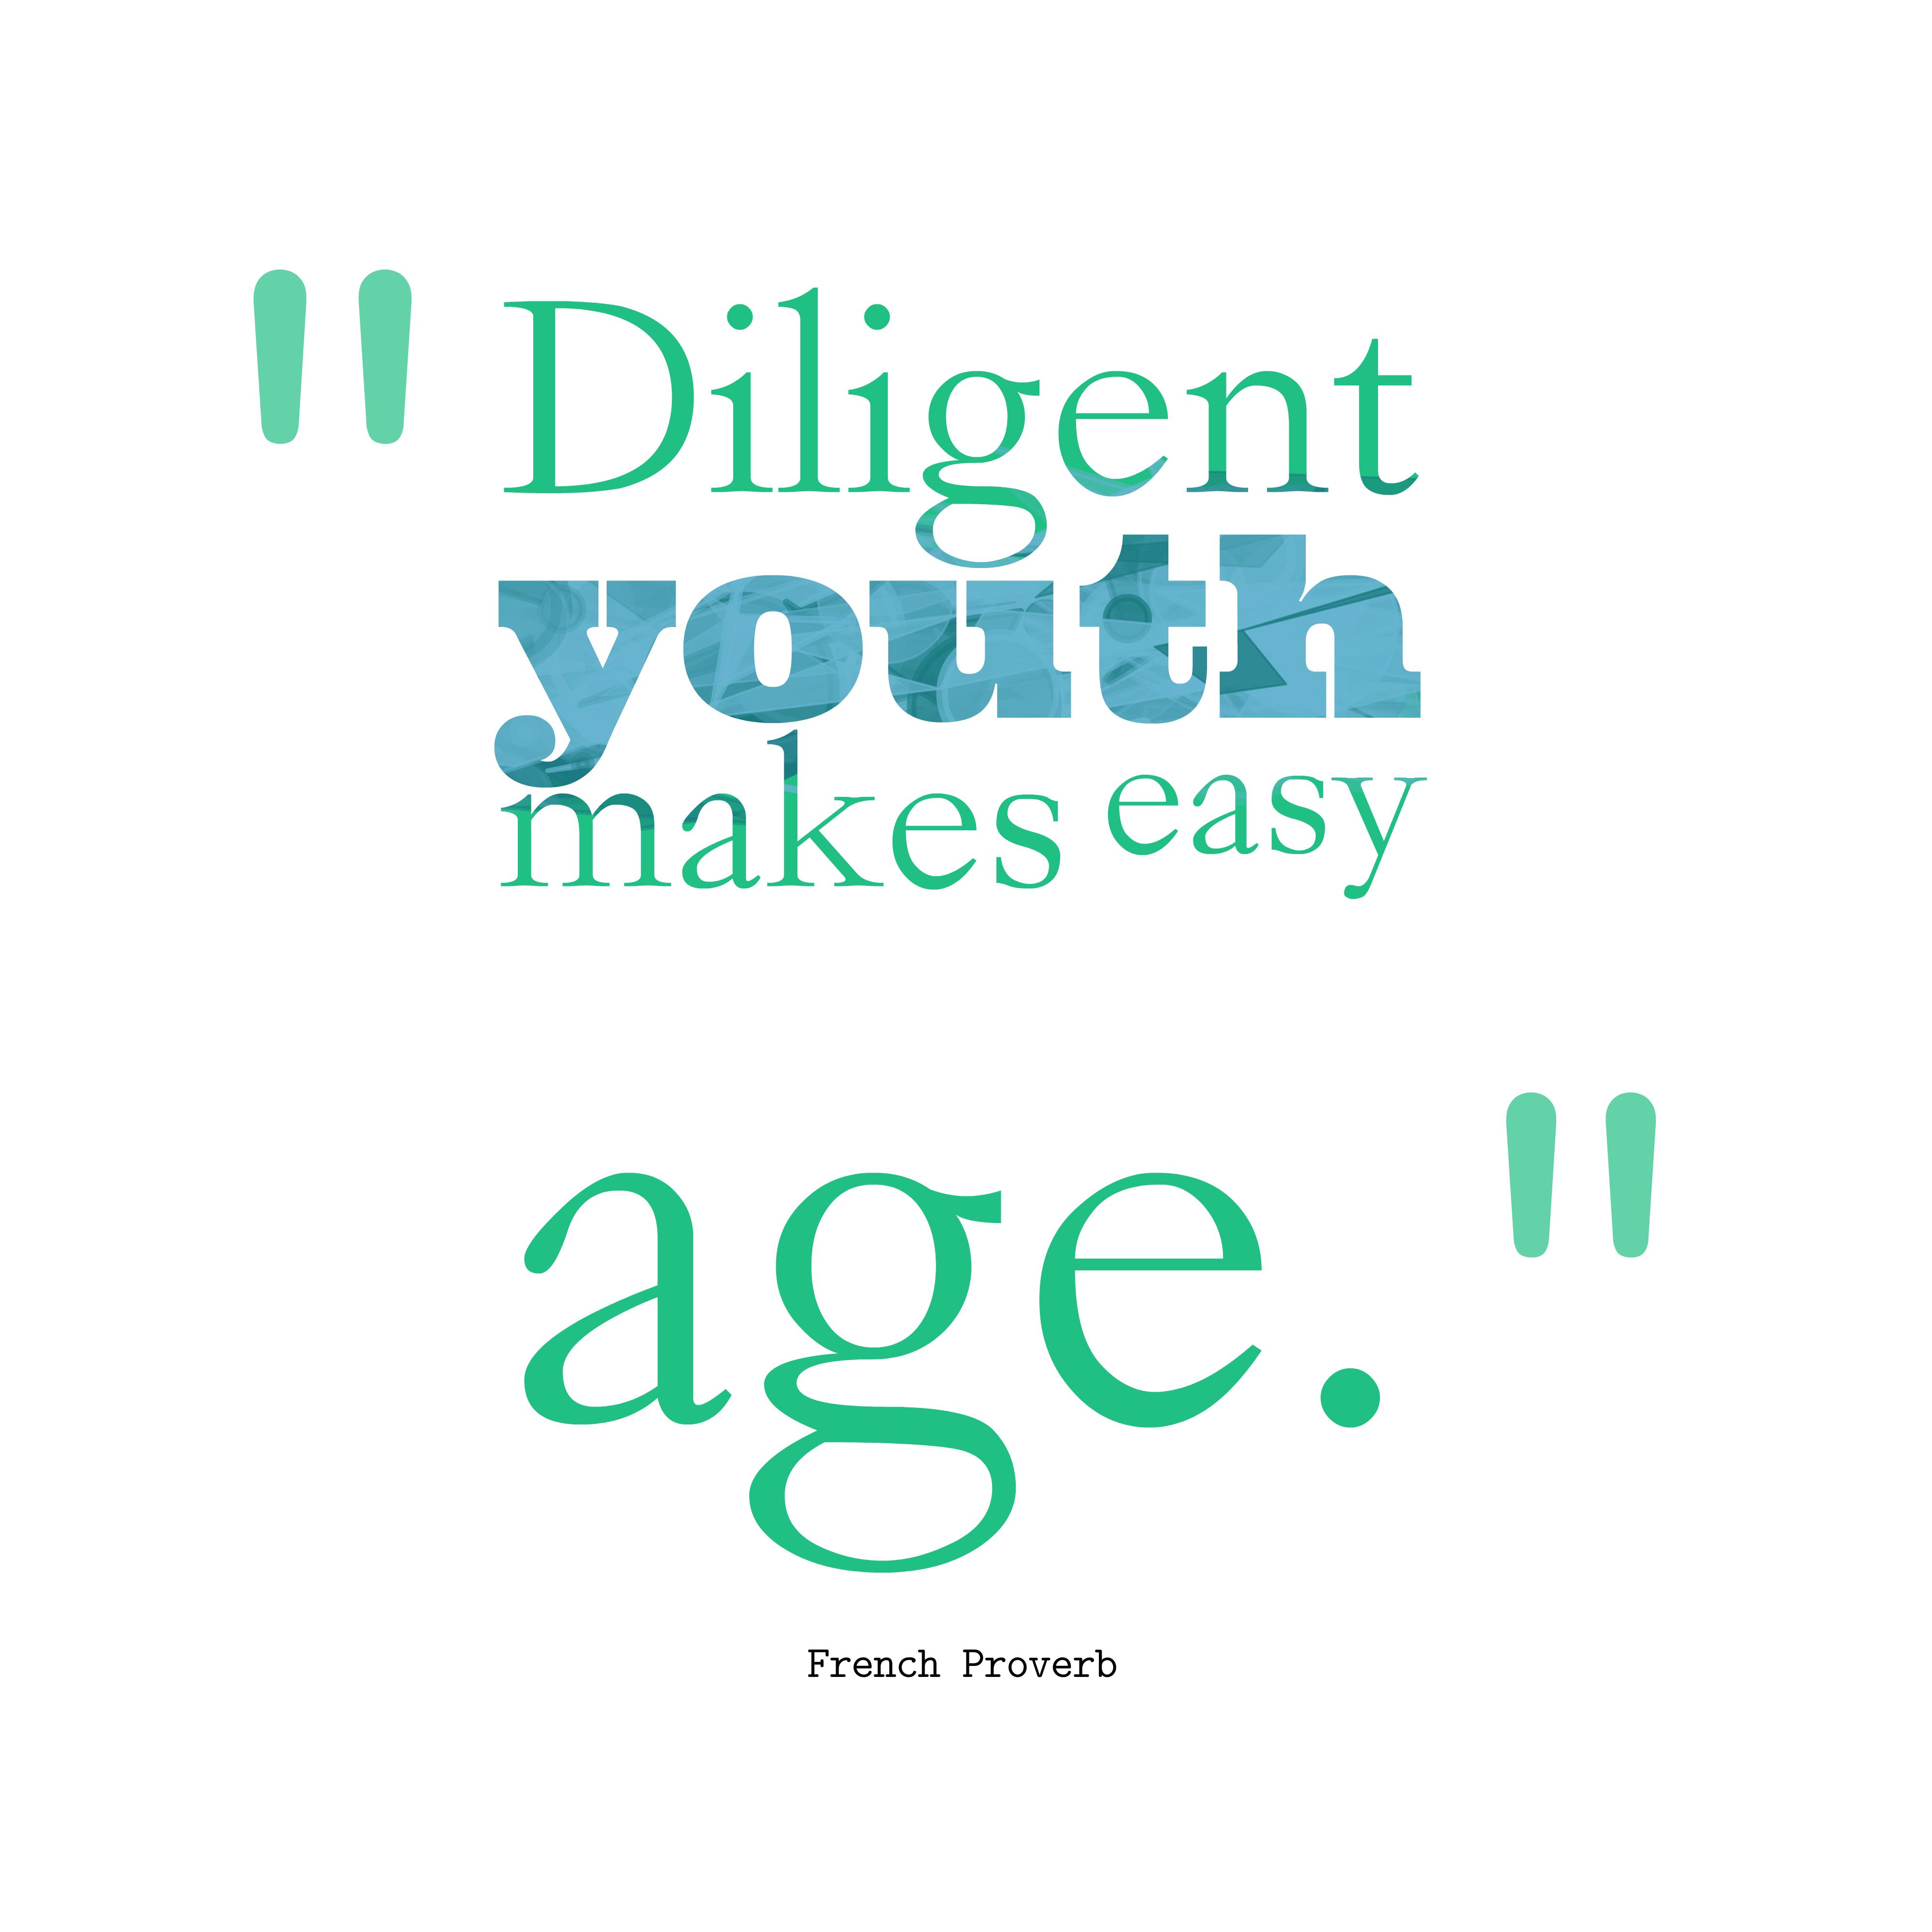 Diligent | www.imgkid.com - The Image Kid Has It!